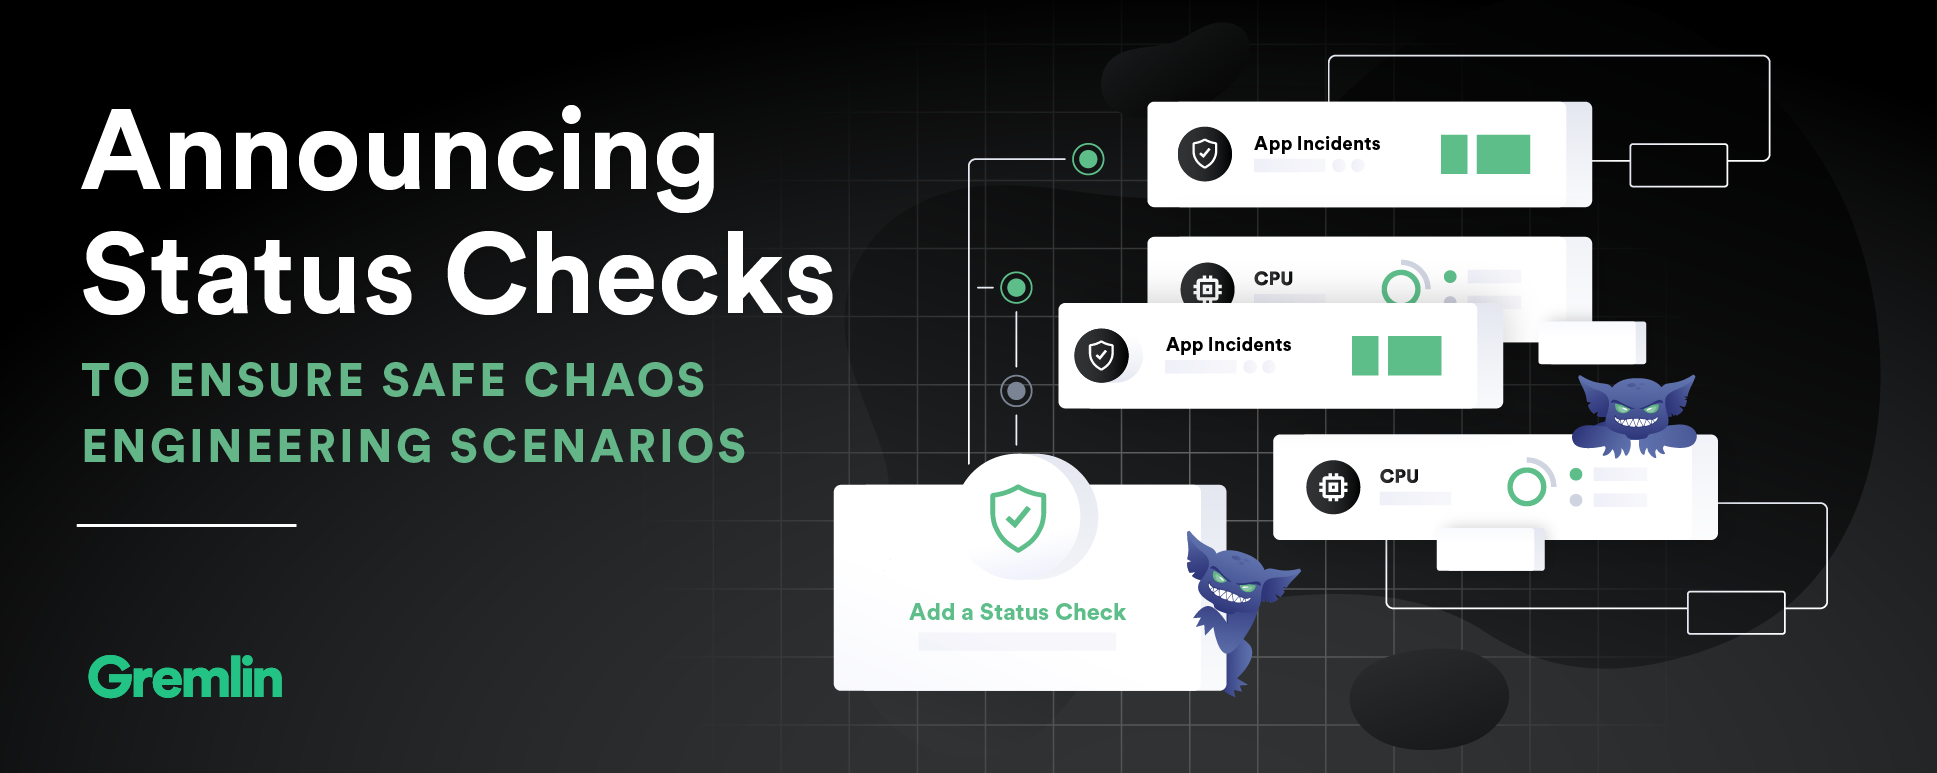 Announcing Status Checks to Ensure Safe Chaos Engineering Scenarios